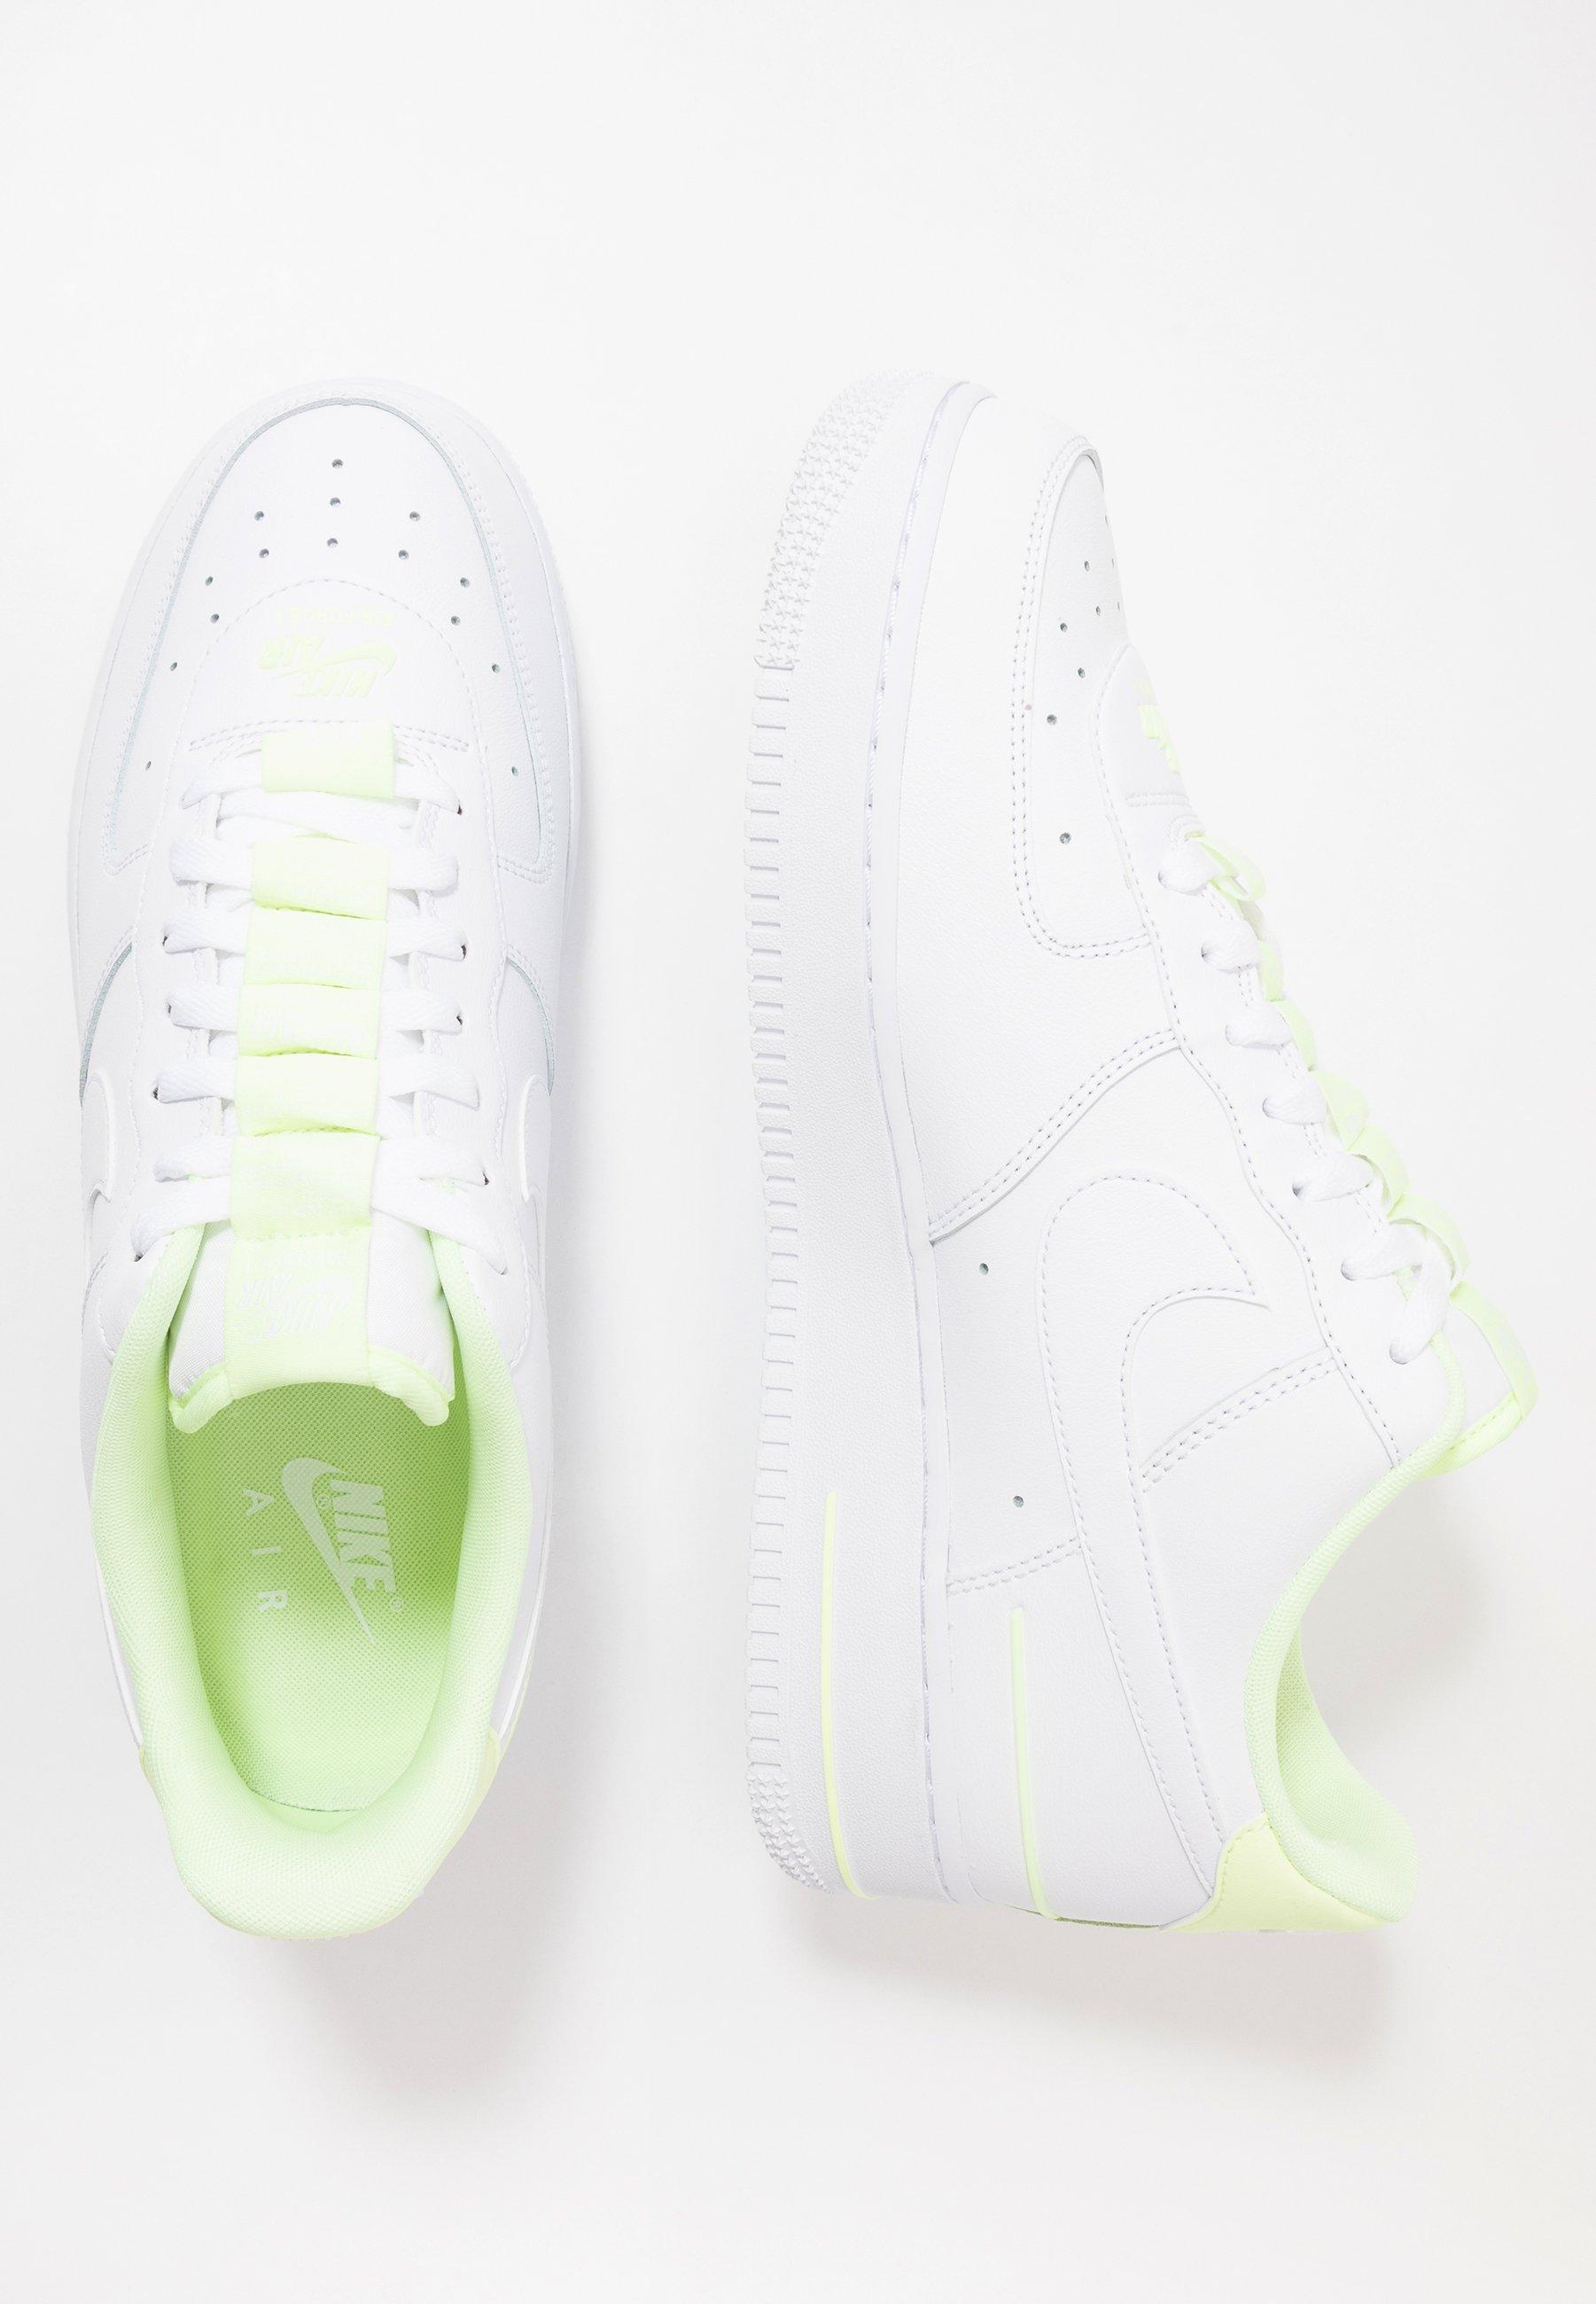 Ricreazione Mediatore Cavo  Nike Sportswear AIR FORCE 1 '07 LV8 - Sneakers basse - white/barely volt